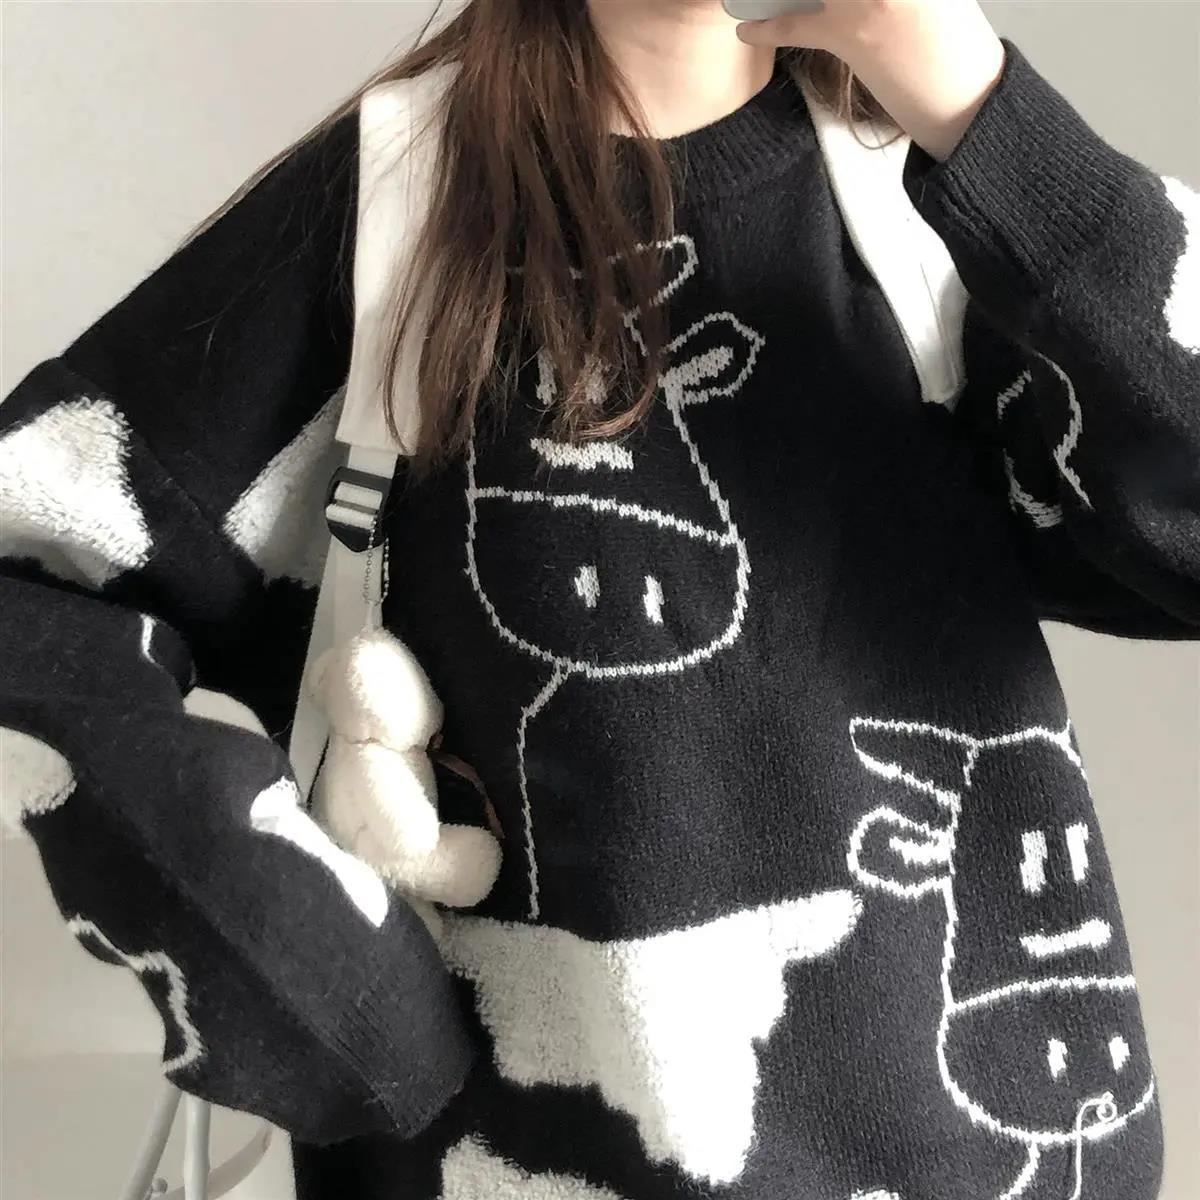 Egirl Harajuku pullover with a cow print 50